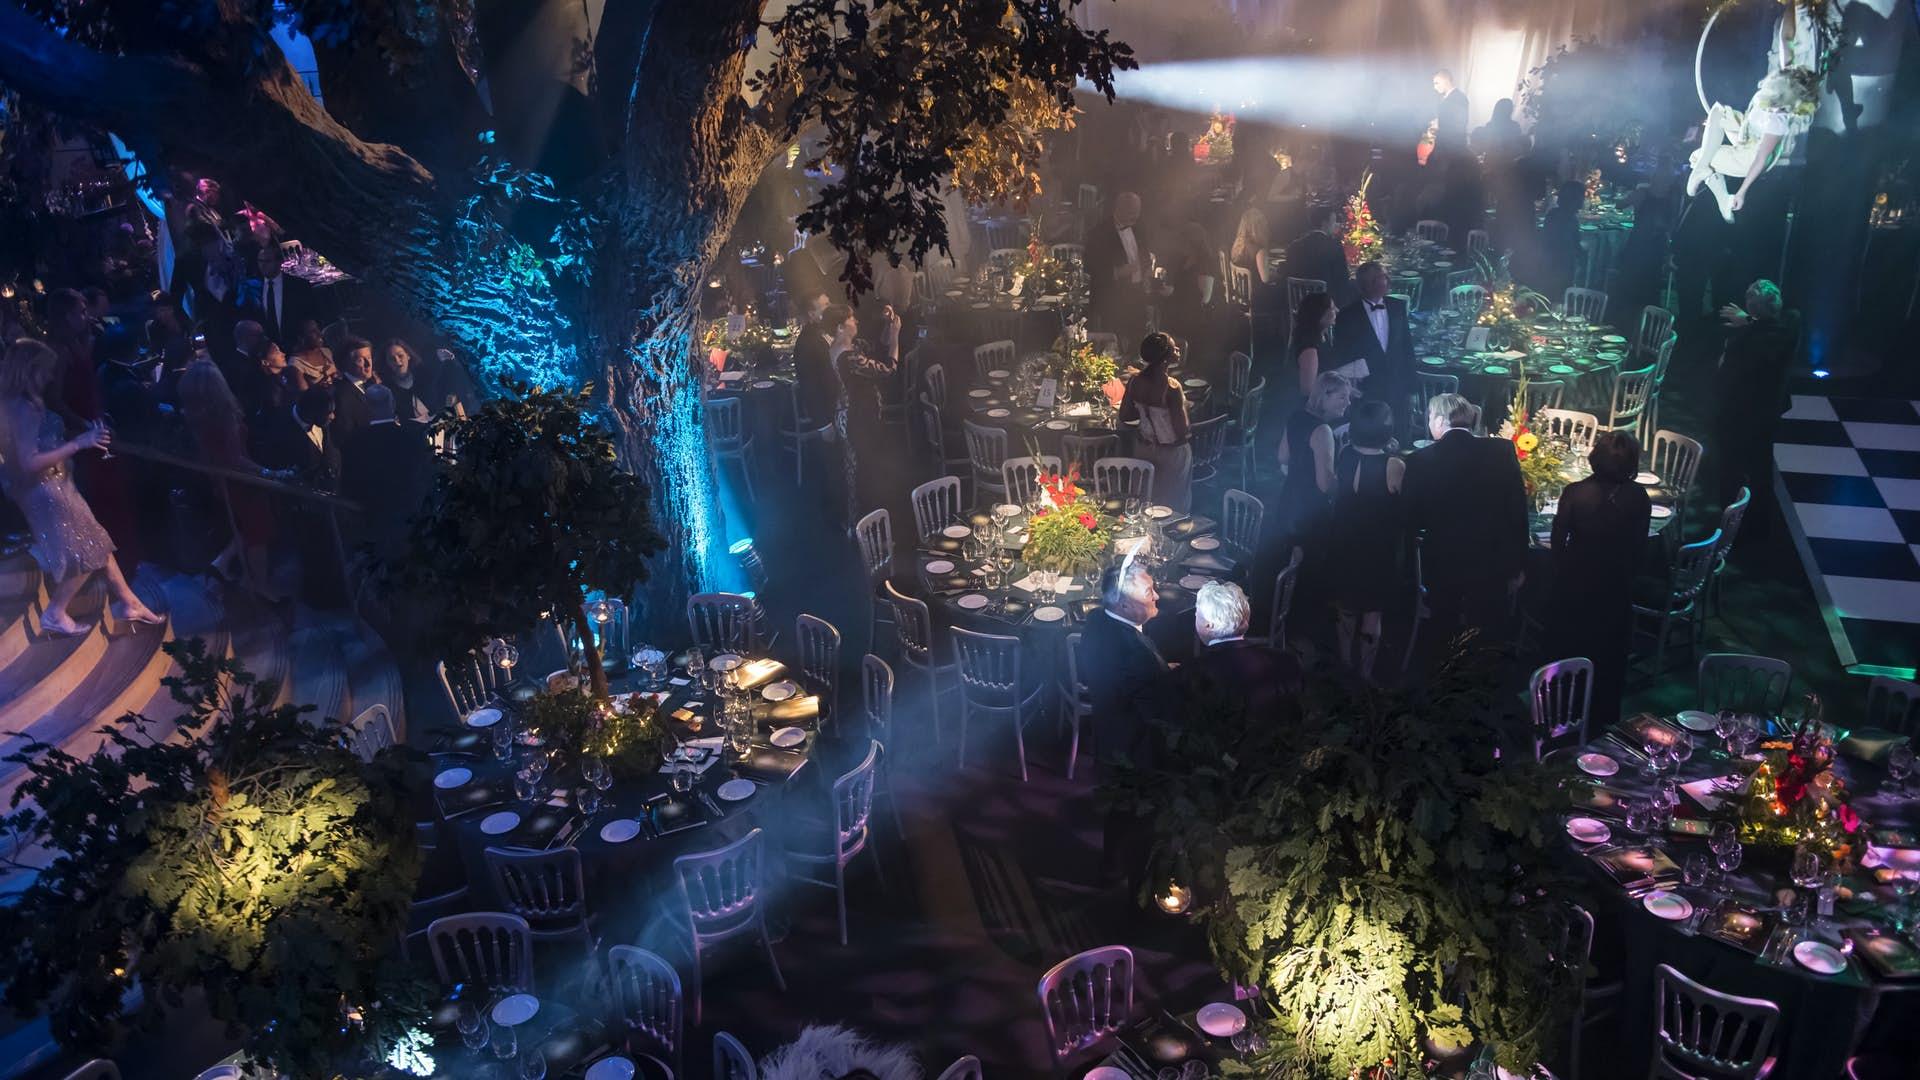 Underglobe dinner set up